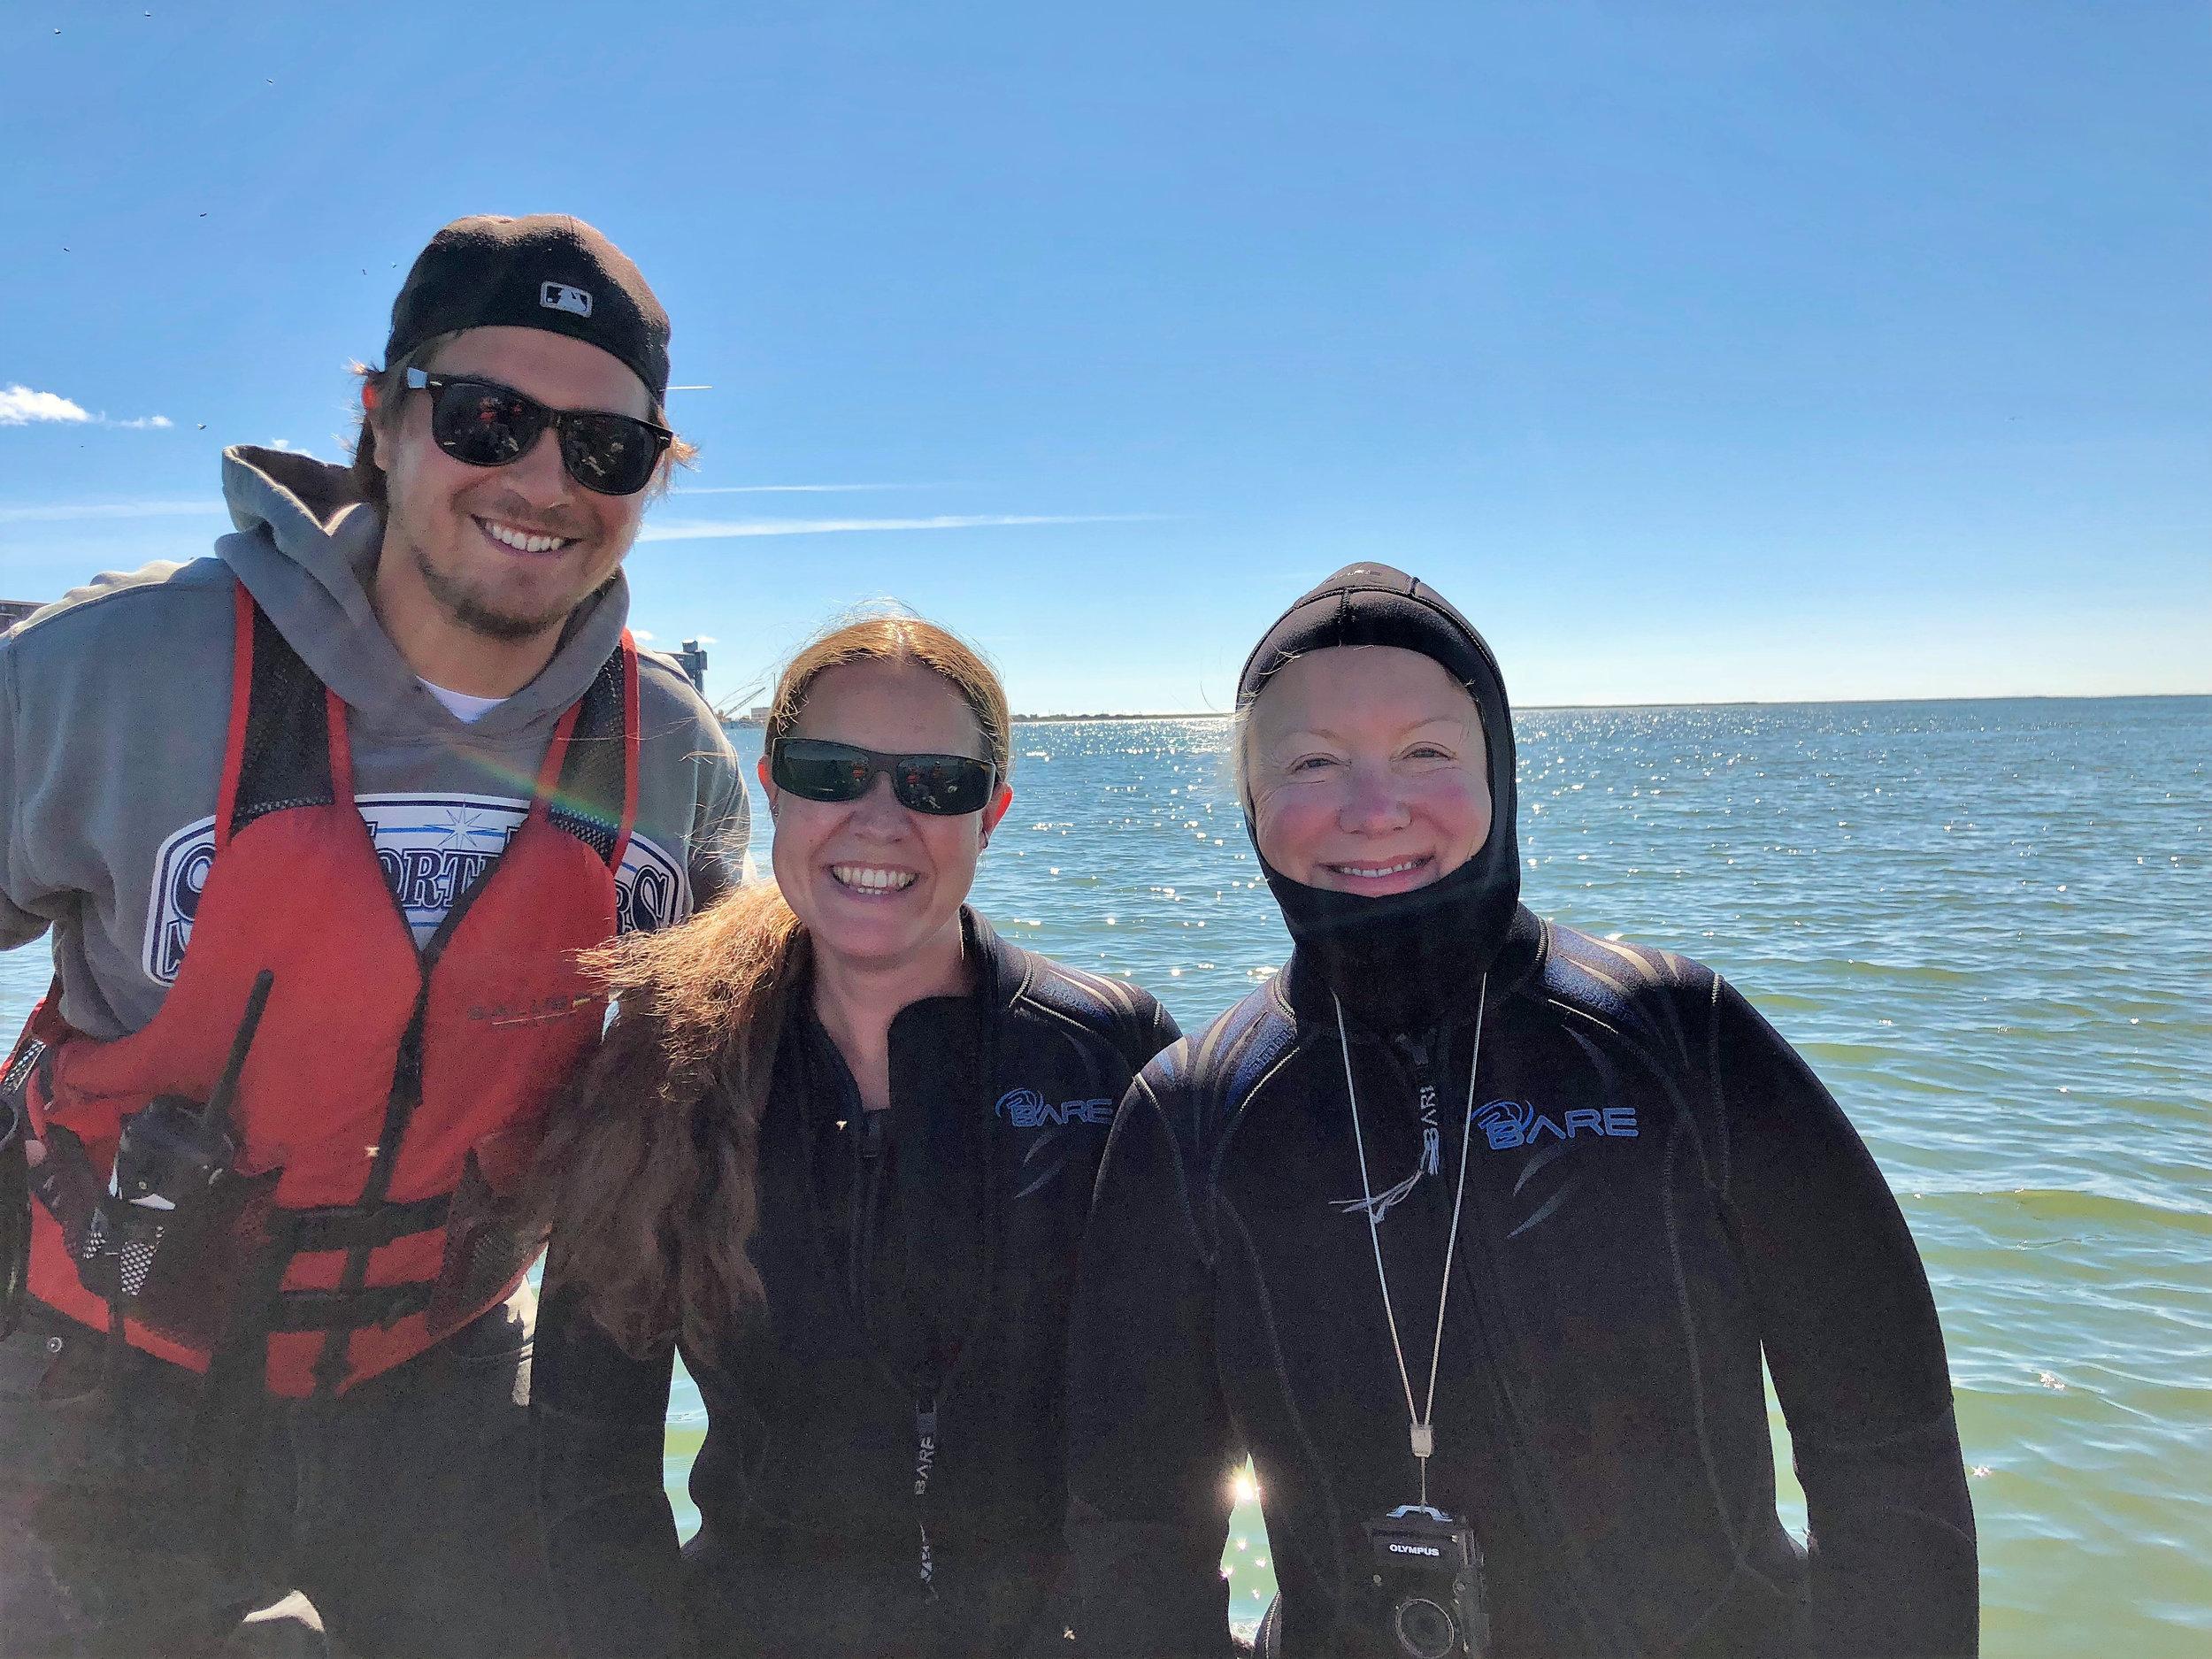 teri_arctic_snorkeling_whales_spiritedtable26.jpg